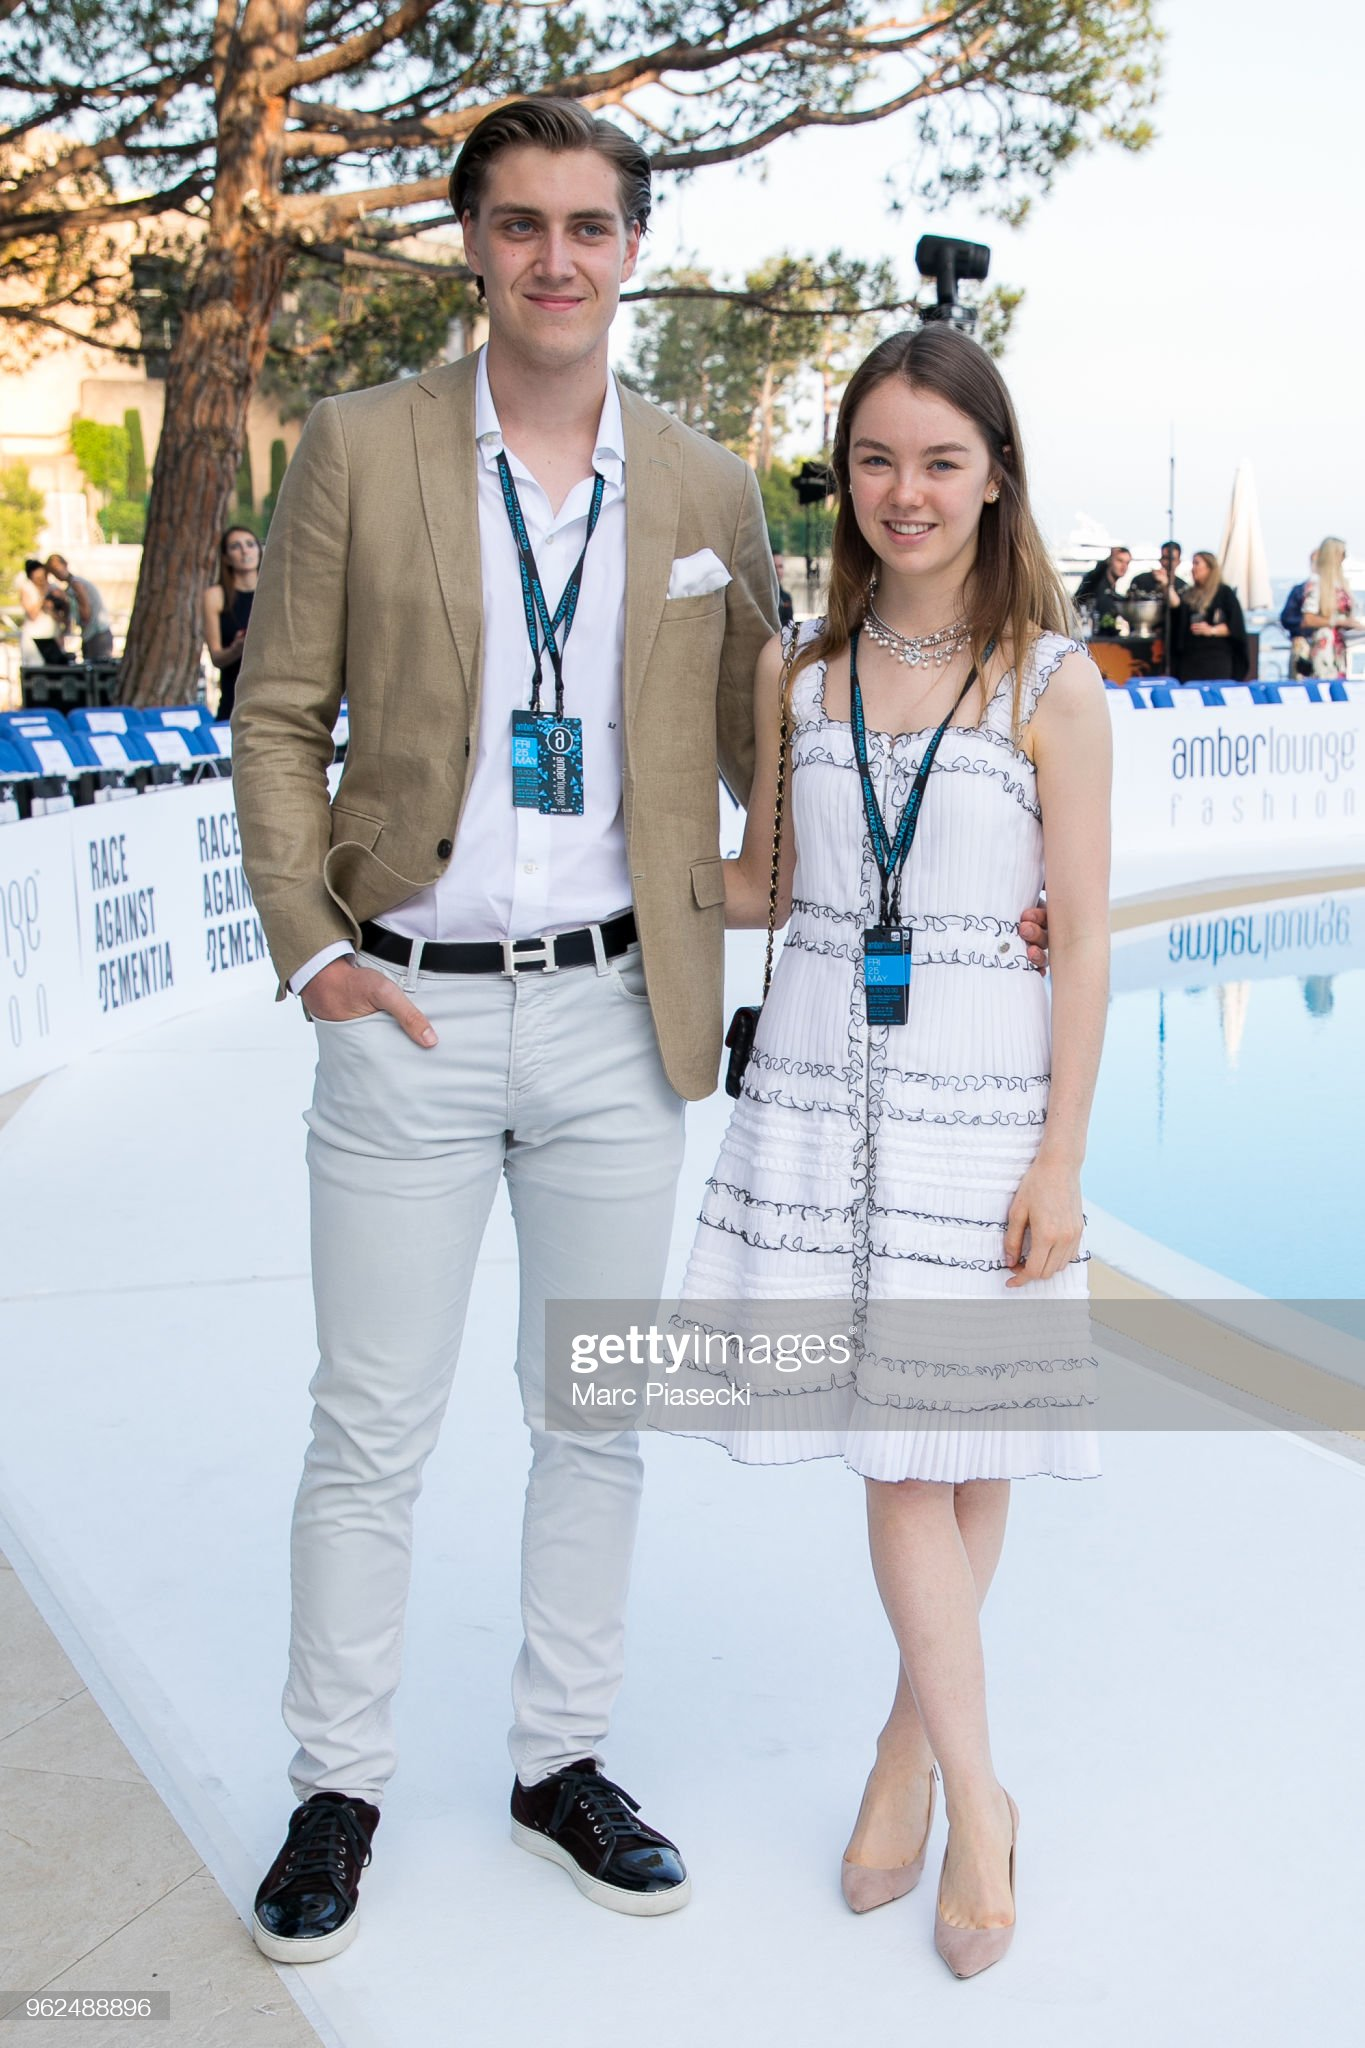 Amber Lounge 2018 Unite Fashion Show In Monaco : News Photo